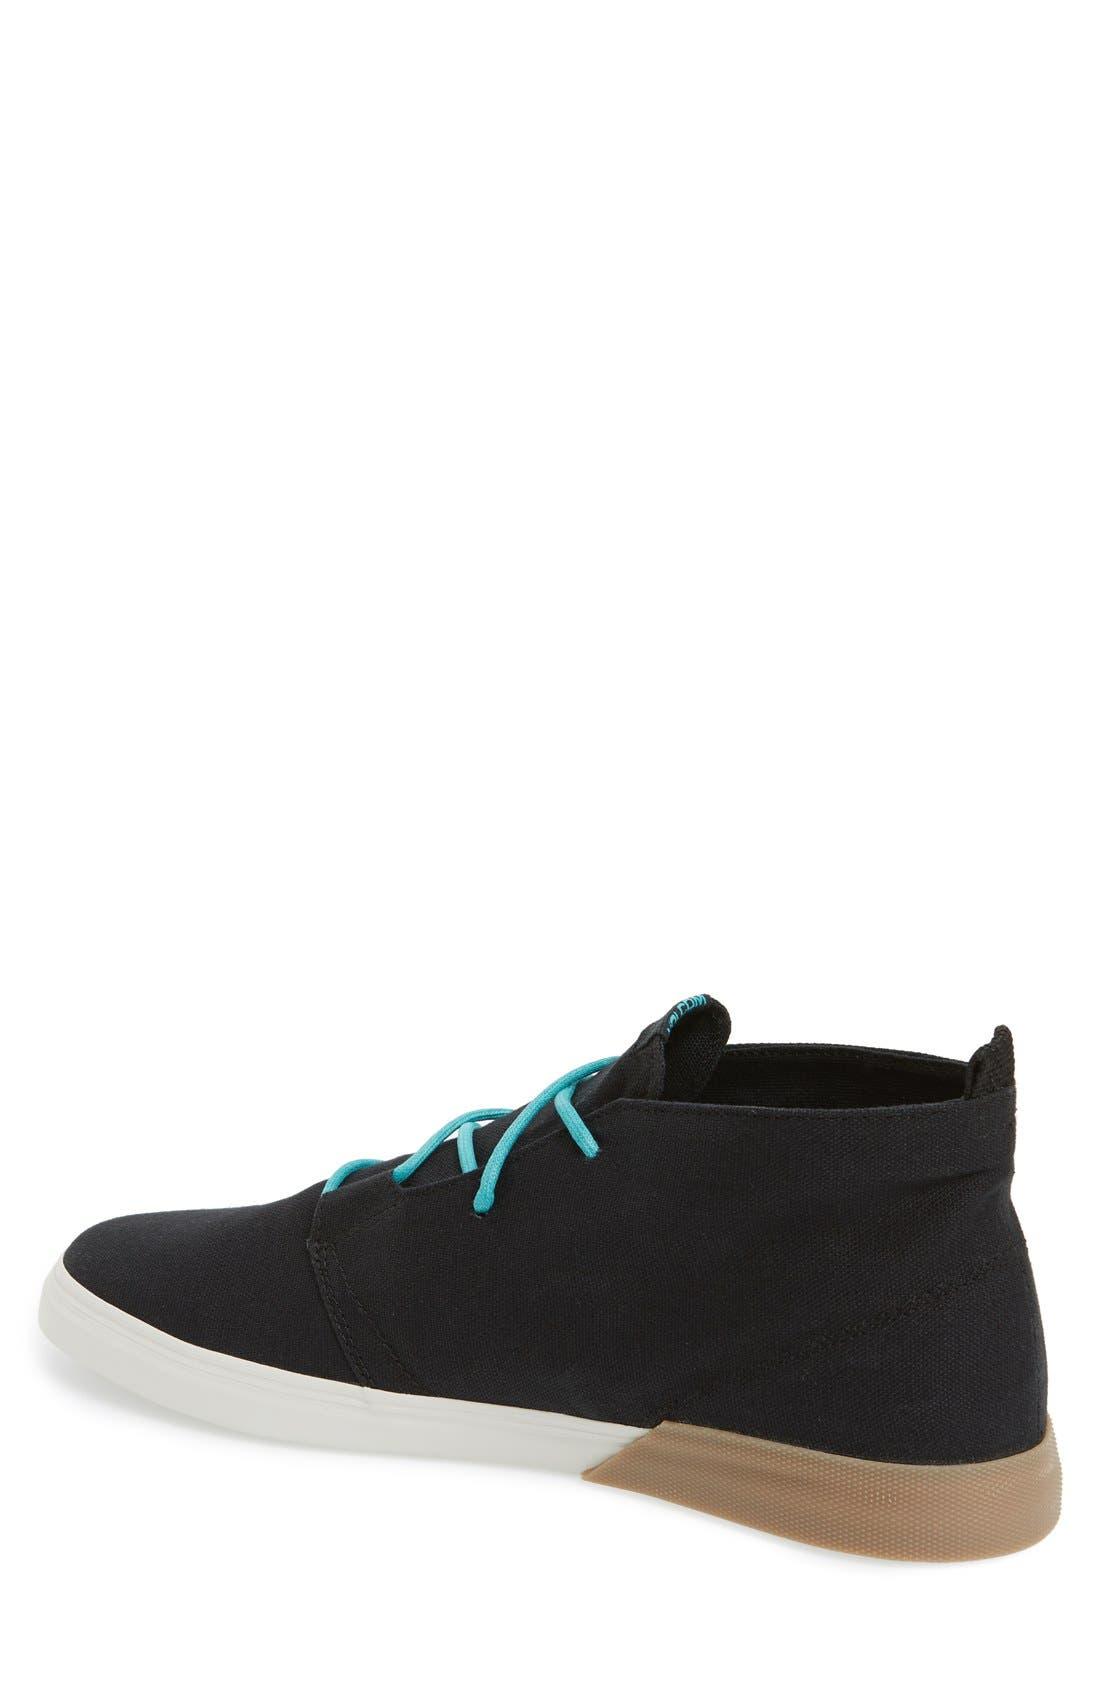 Alternate Image 2  - Volcom 'De Fray' High Top Sneaker